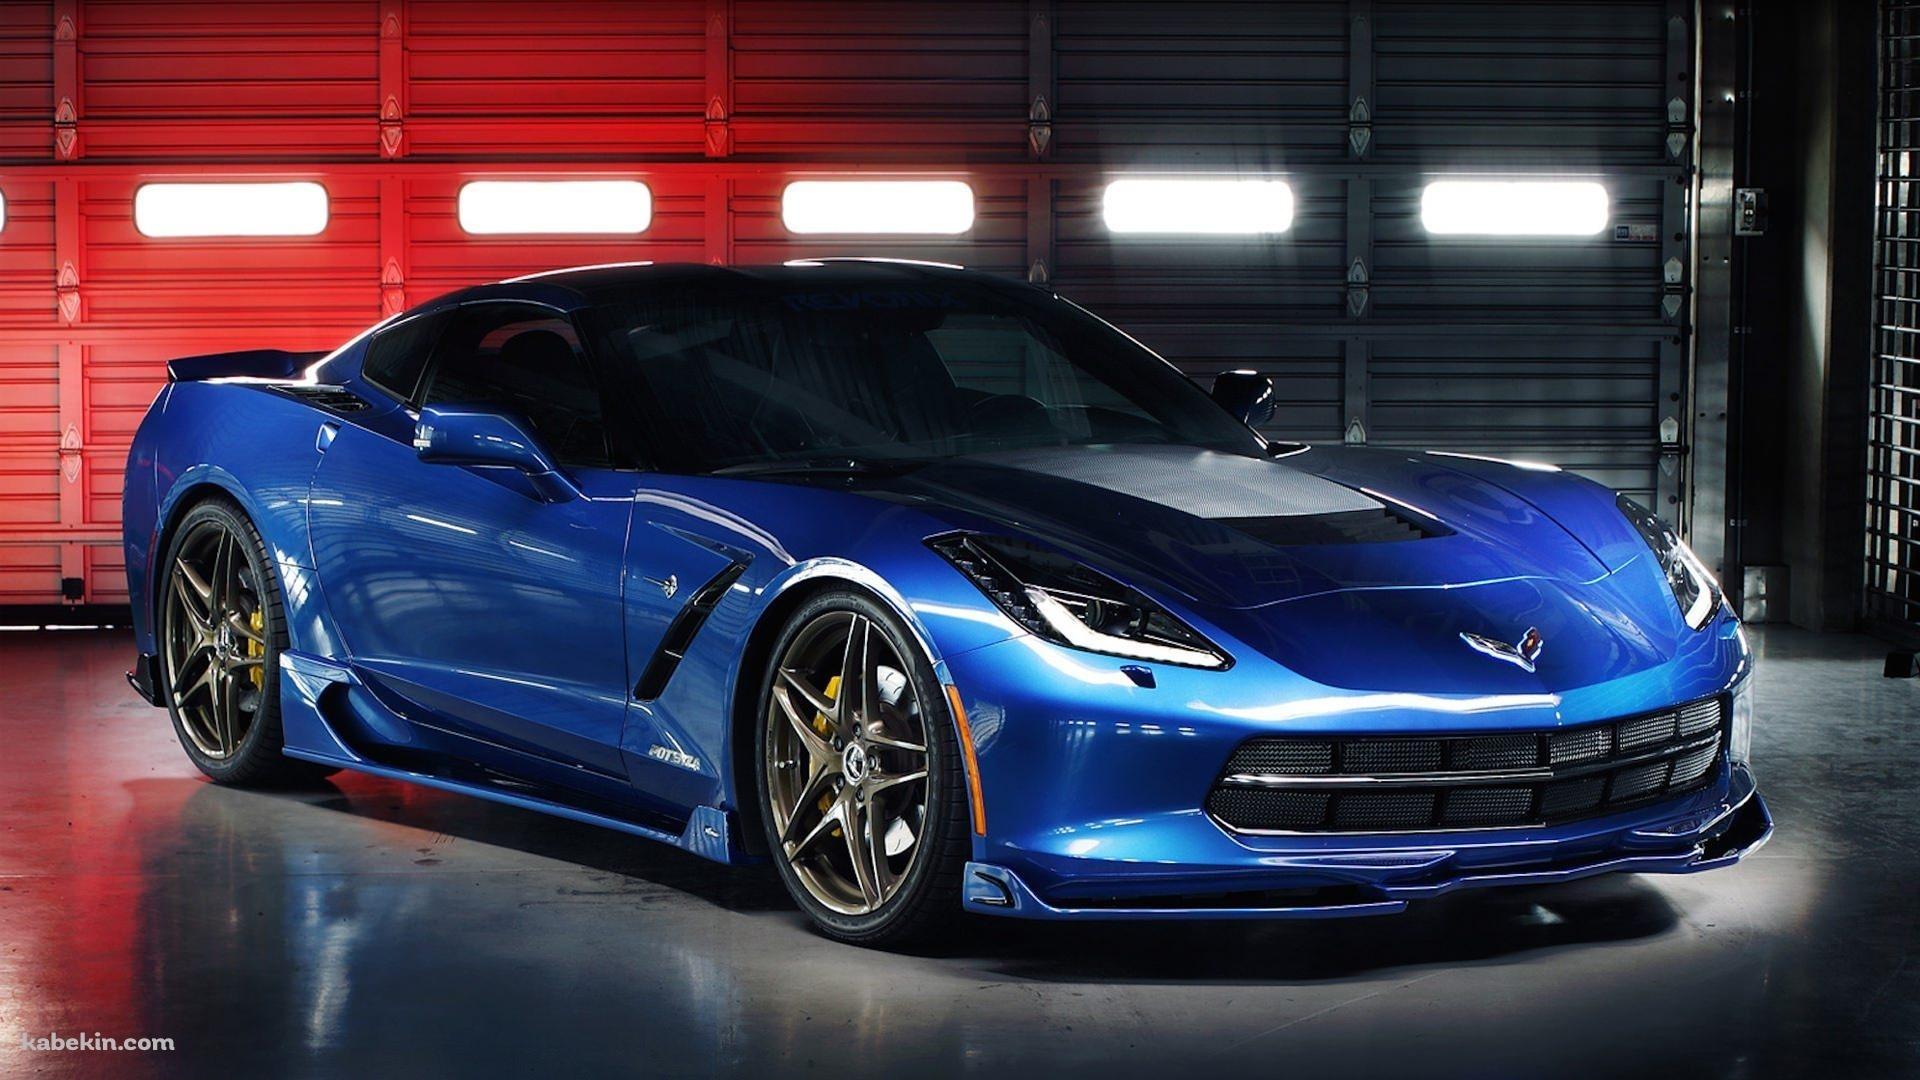 Corvette pc wallpaper